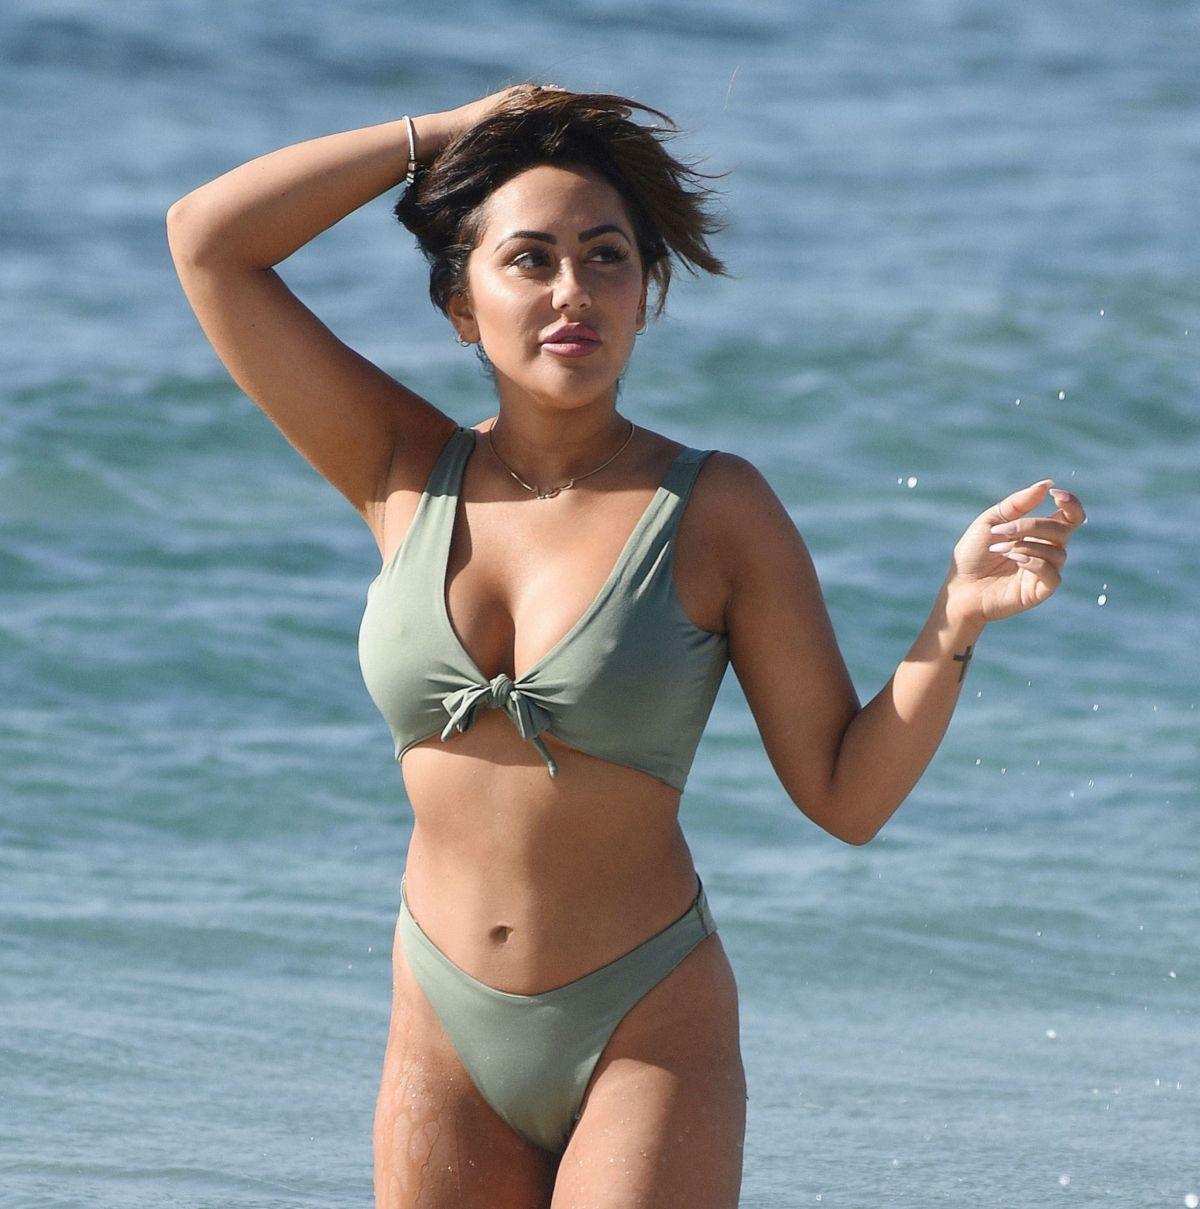 Sophie Kasaei in Bikini on the beach in Turkey Pic 3 of 35